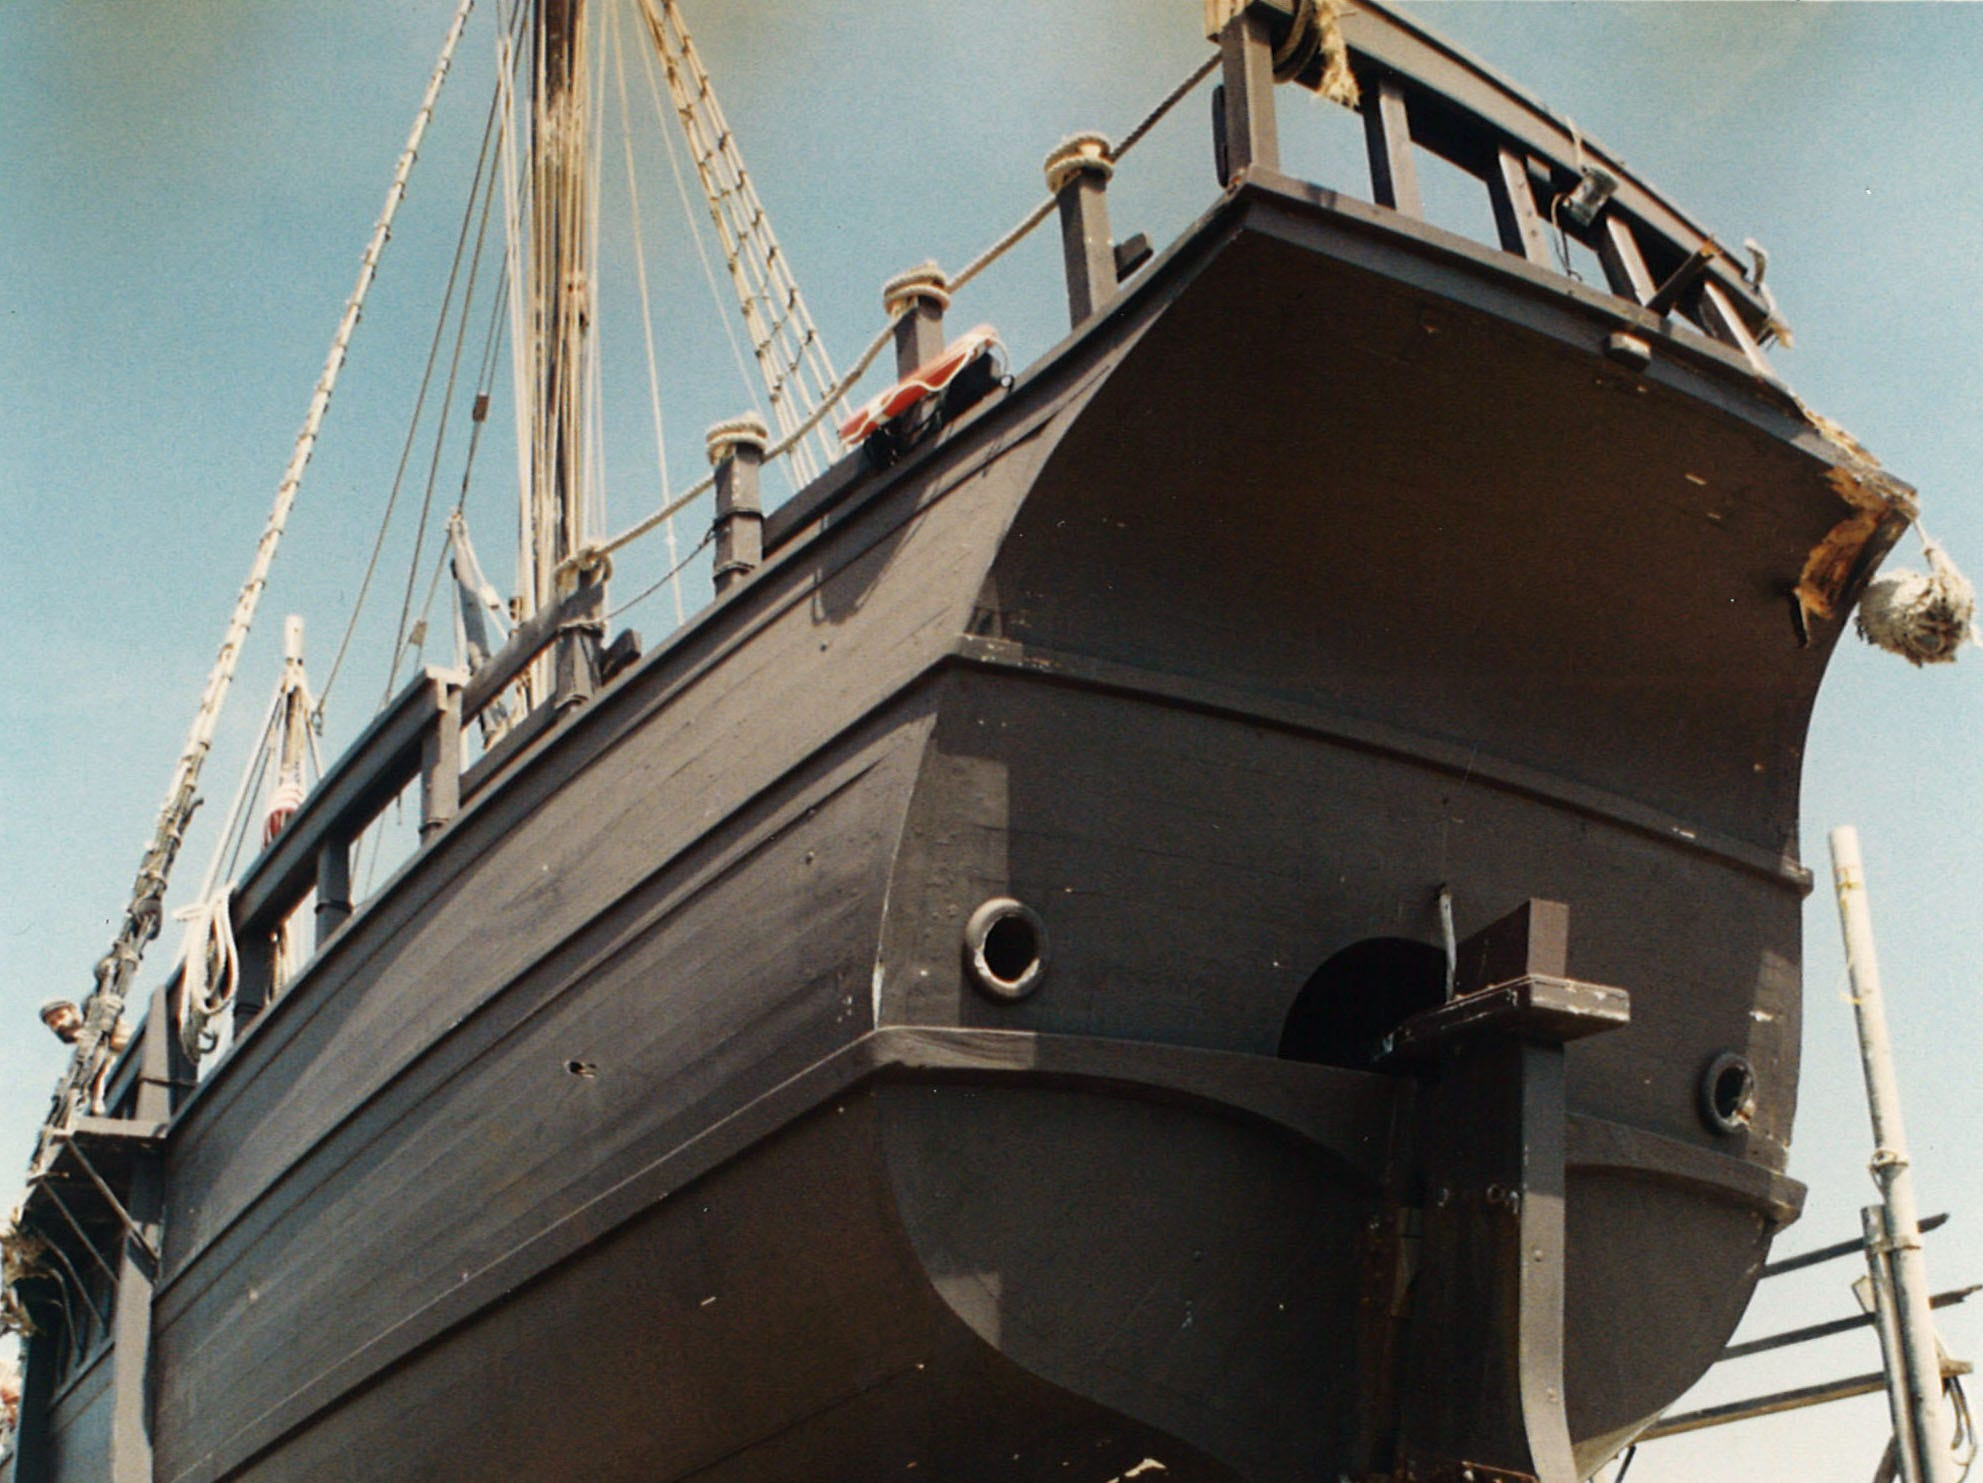 The Columbus ship, the Pinta, on dry dock at the Gulf King Shipyard in Aransas Pass on April 21, 1994.